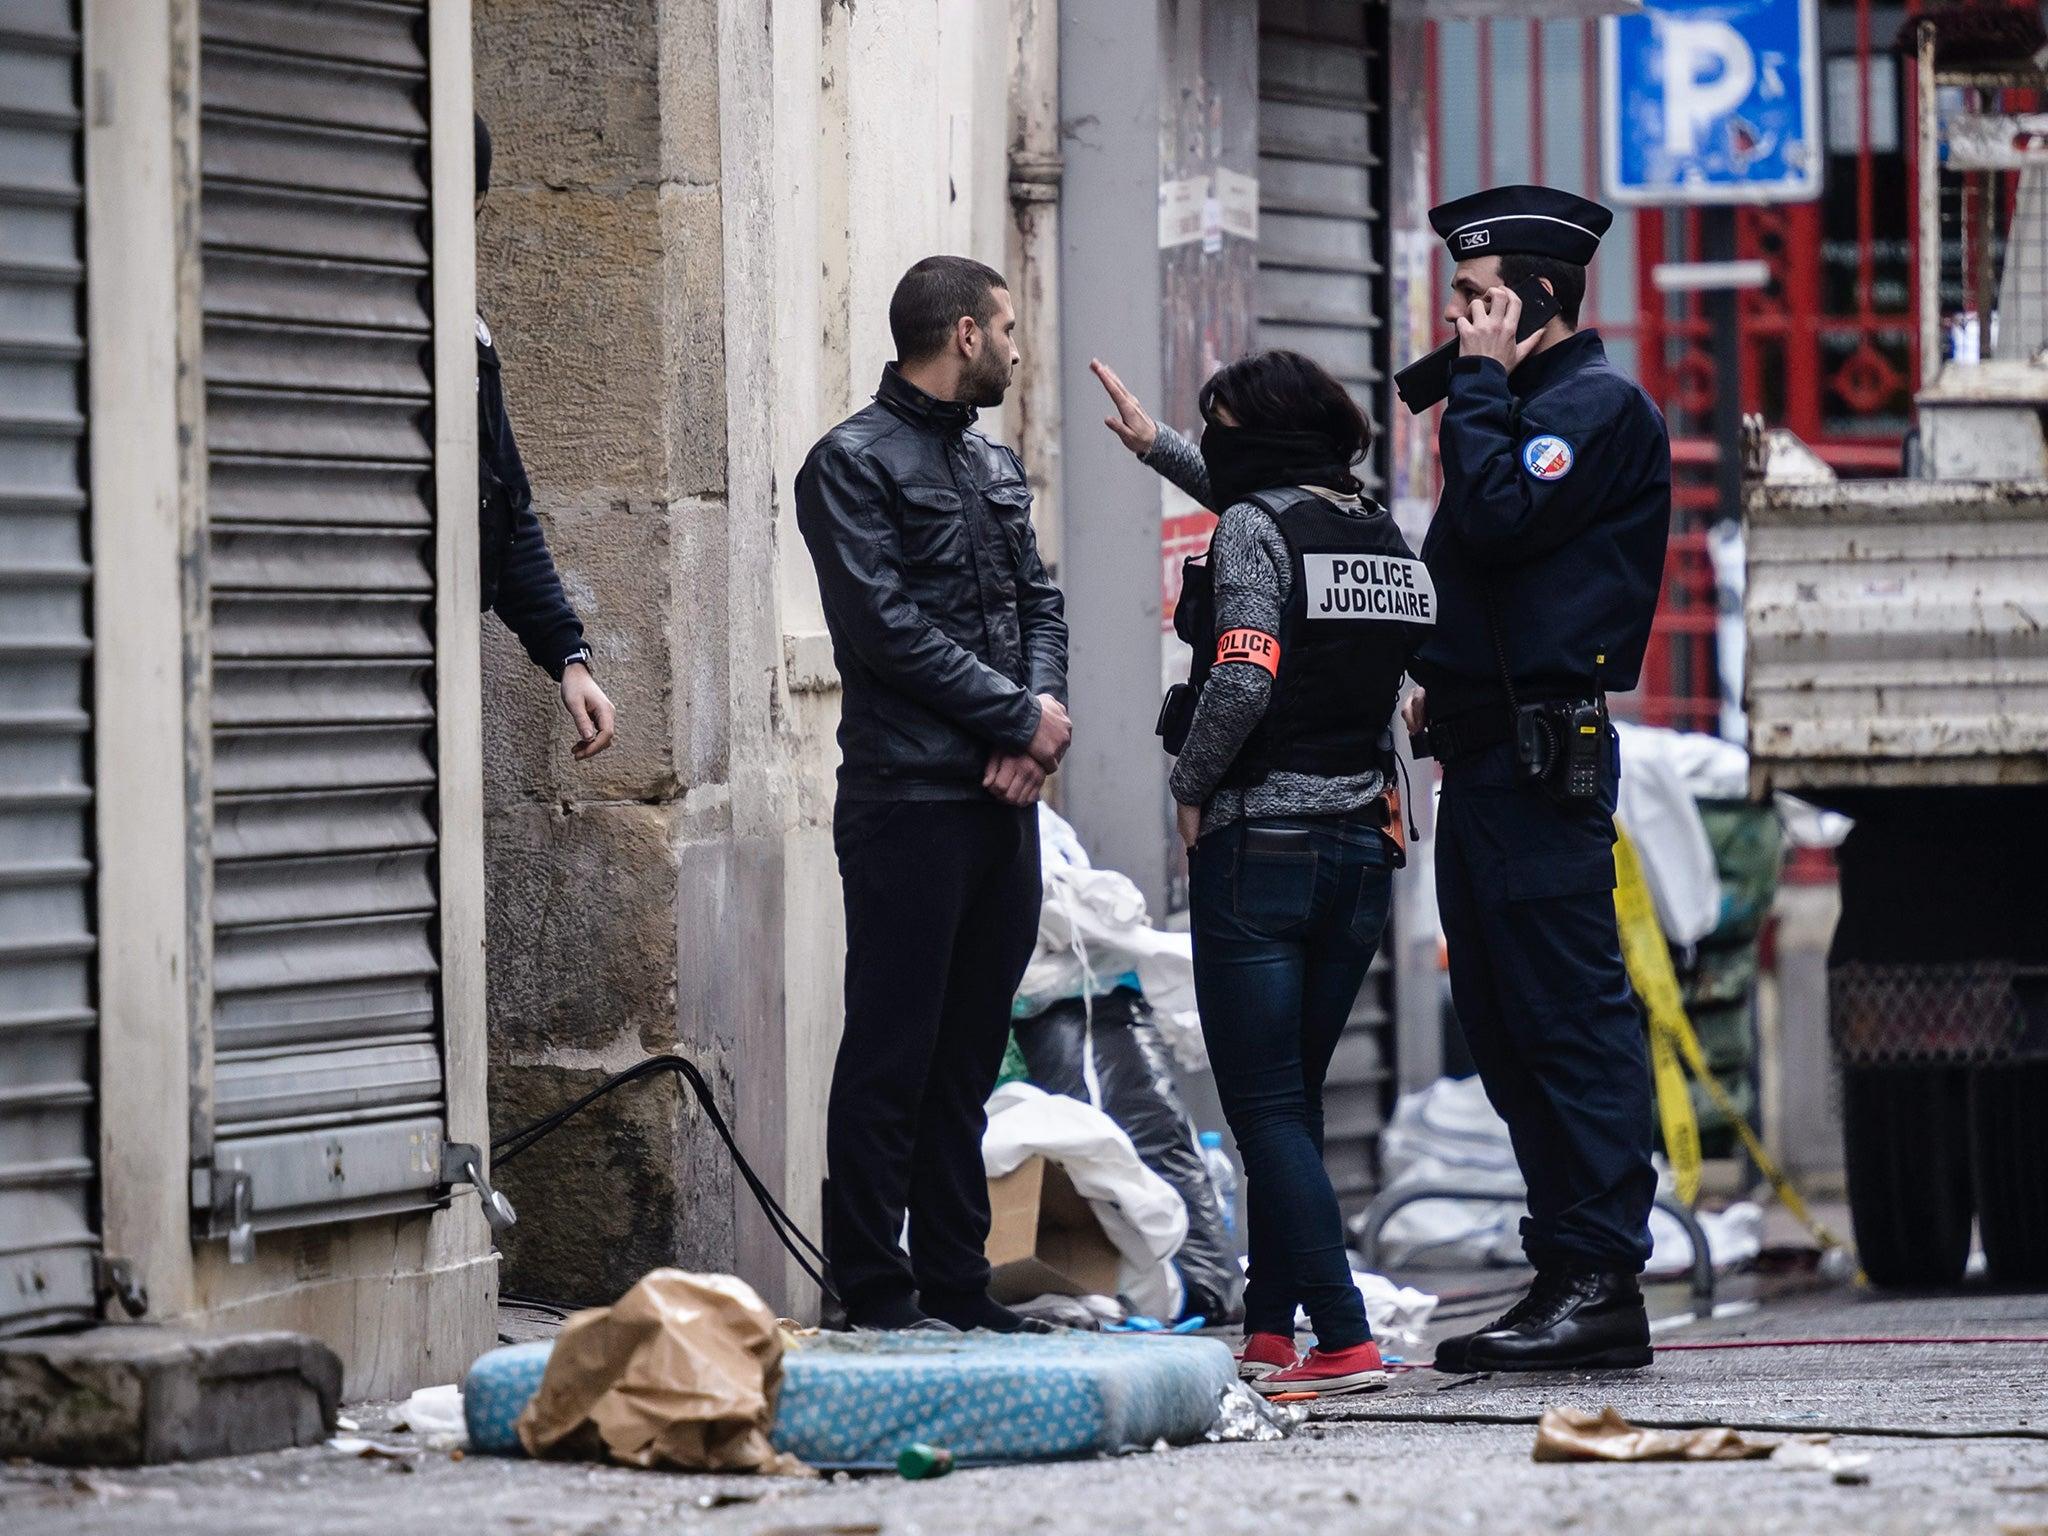 saint denis paris attacks raid head of france s elite anti terrorist force says he saw bomber 39 s. Black Bedroom Furniture Sets. Home Design Ideas